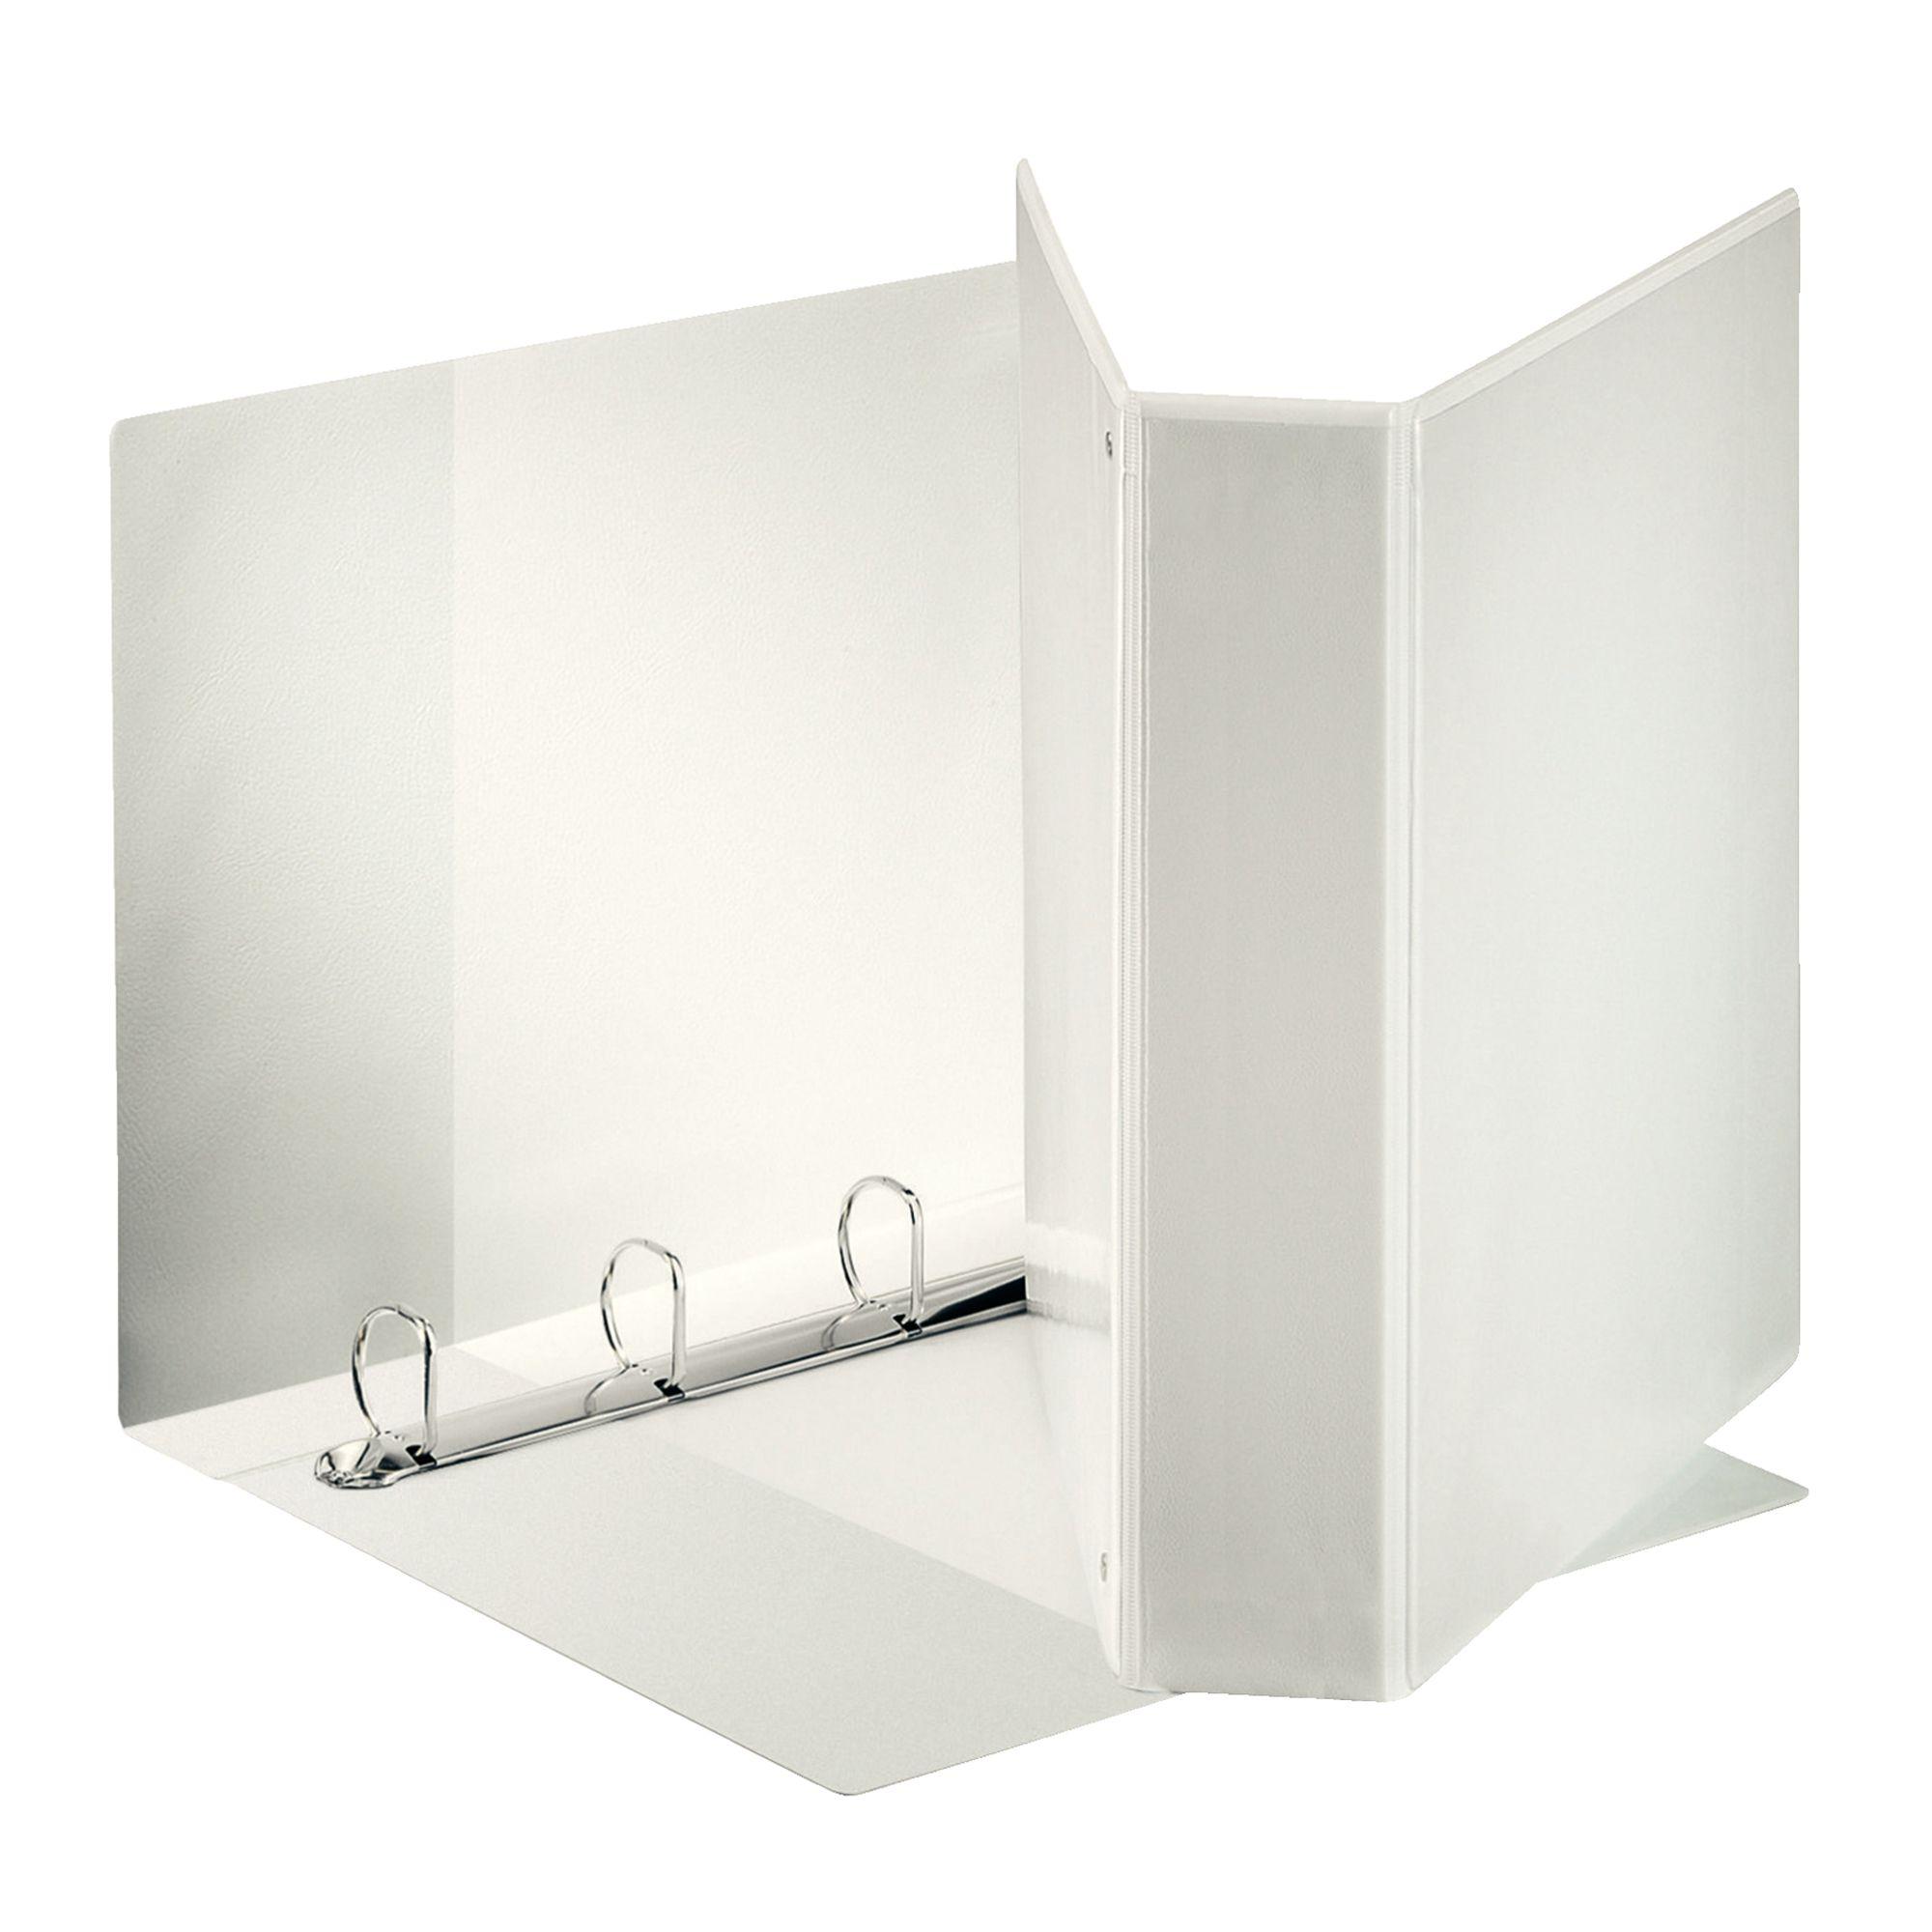 Raccoglitore display maxi 22x30cm 4d h30mm bianco personalizzabile esselte 394756000 8004157475607